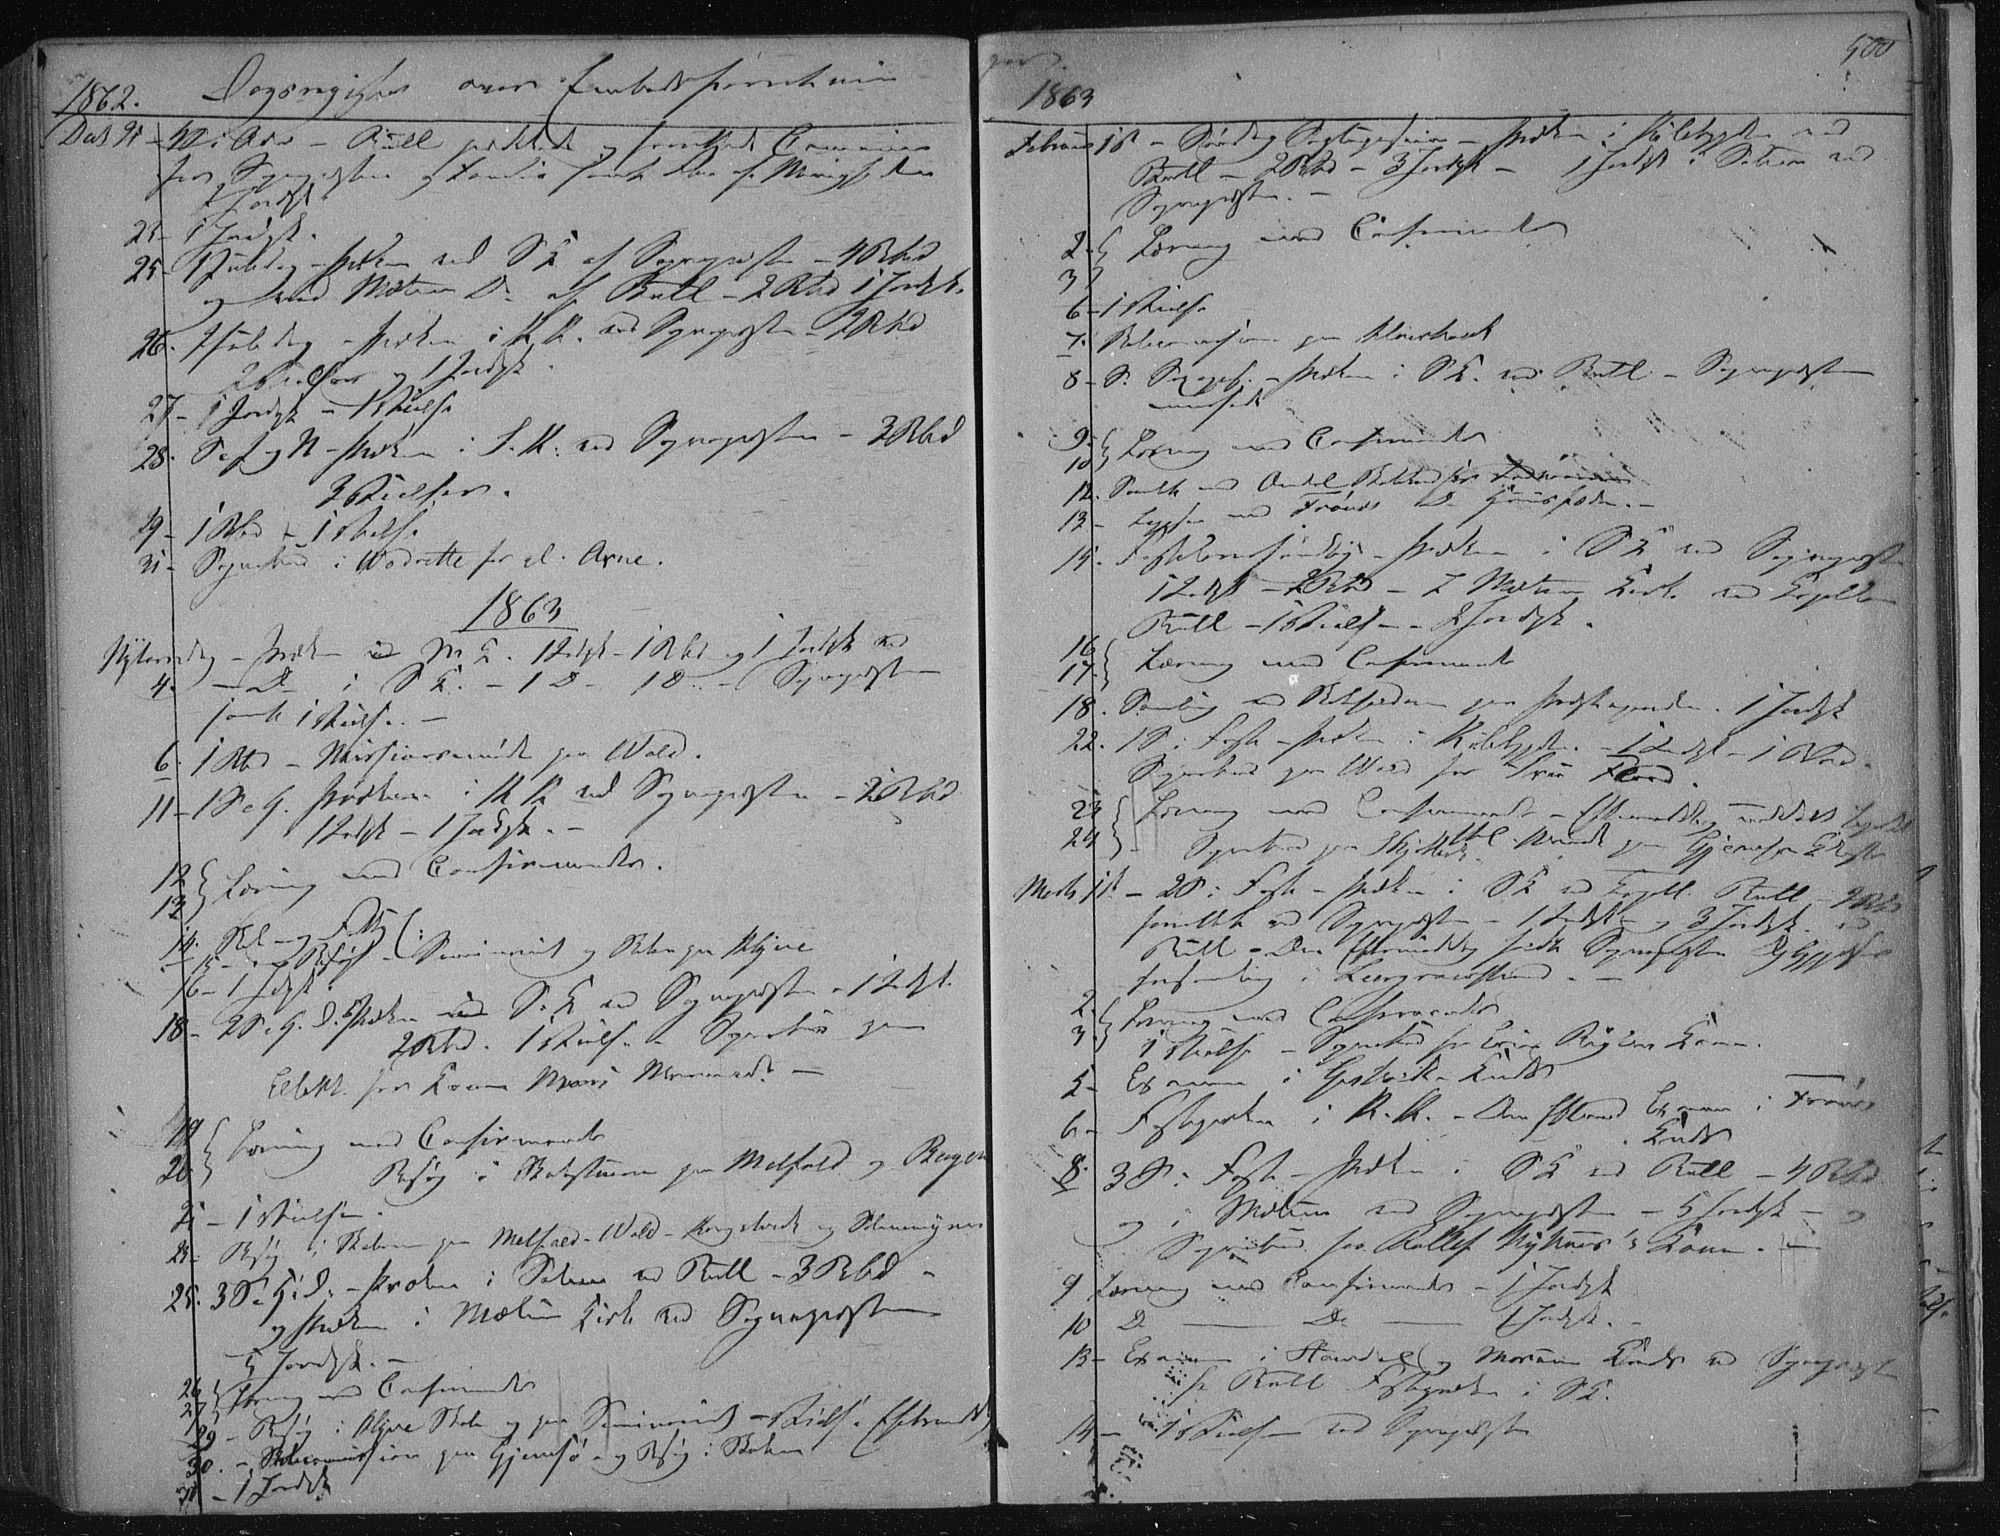 SAKO, Solum kirkebøker, F/Fa/L0007: Ministerialbok nr. I 7, 1856-1864, s. 500